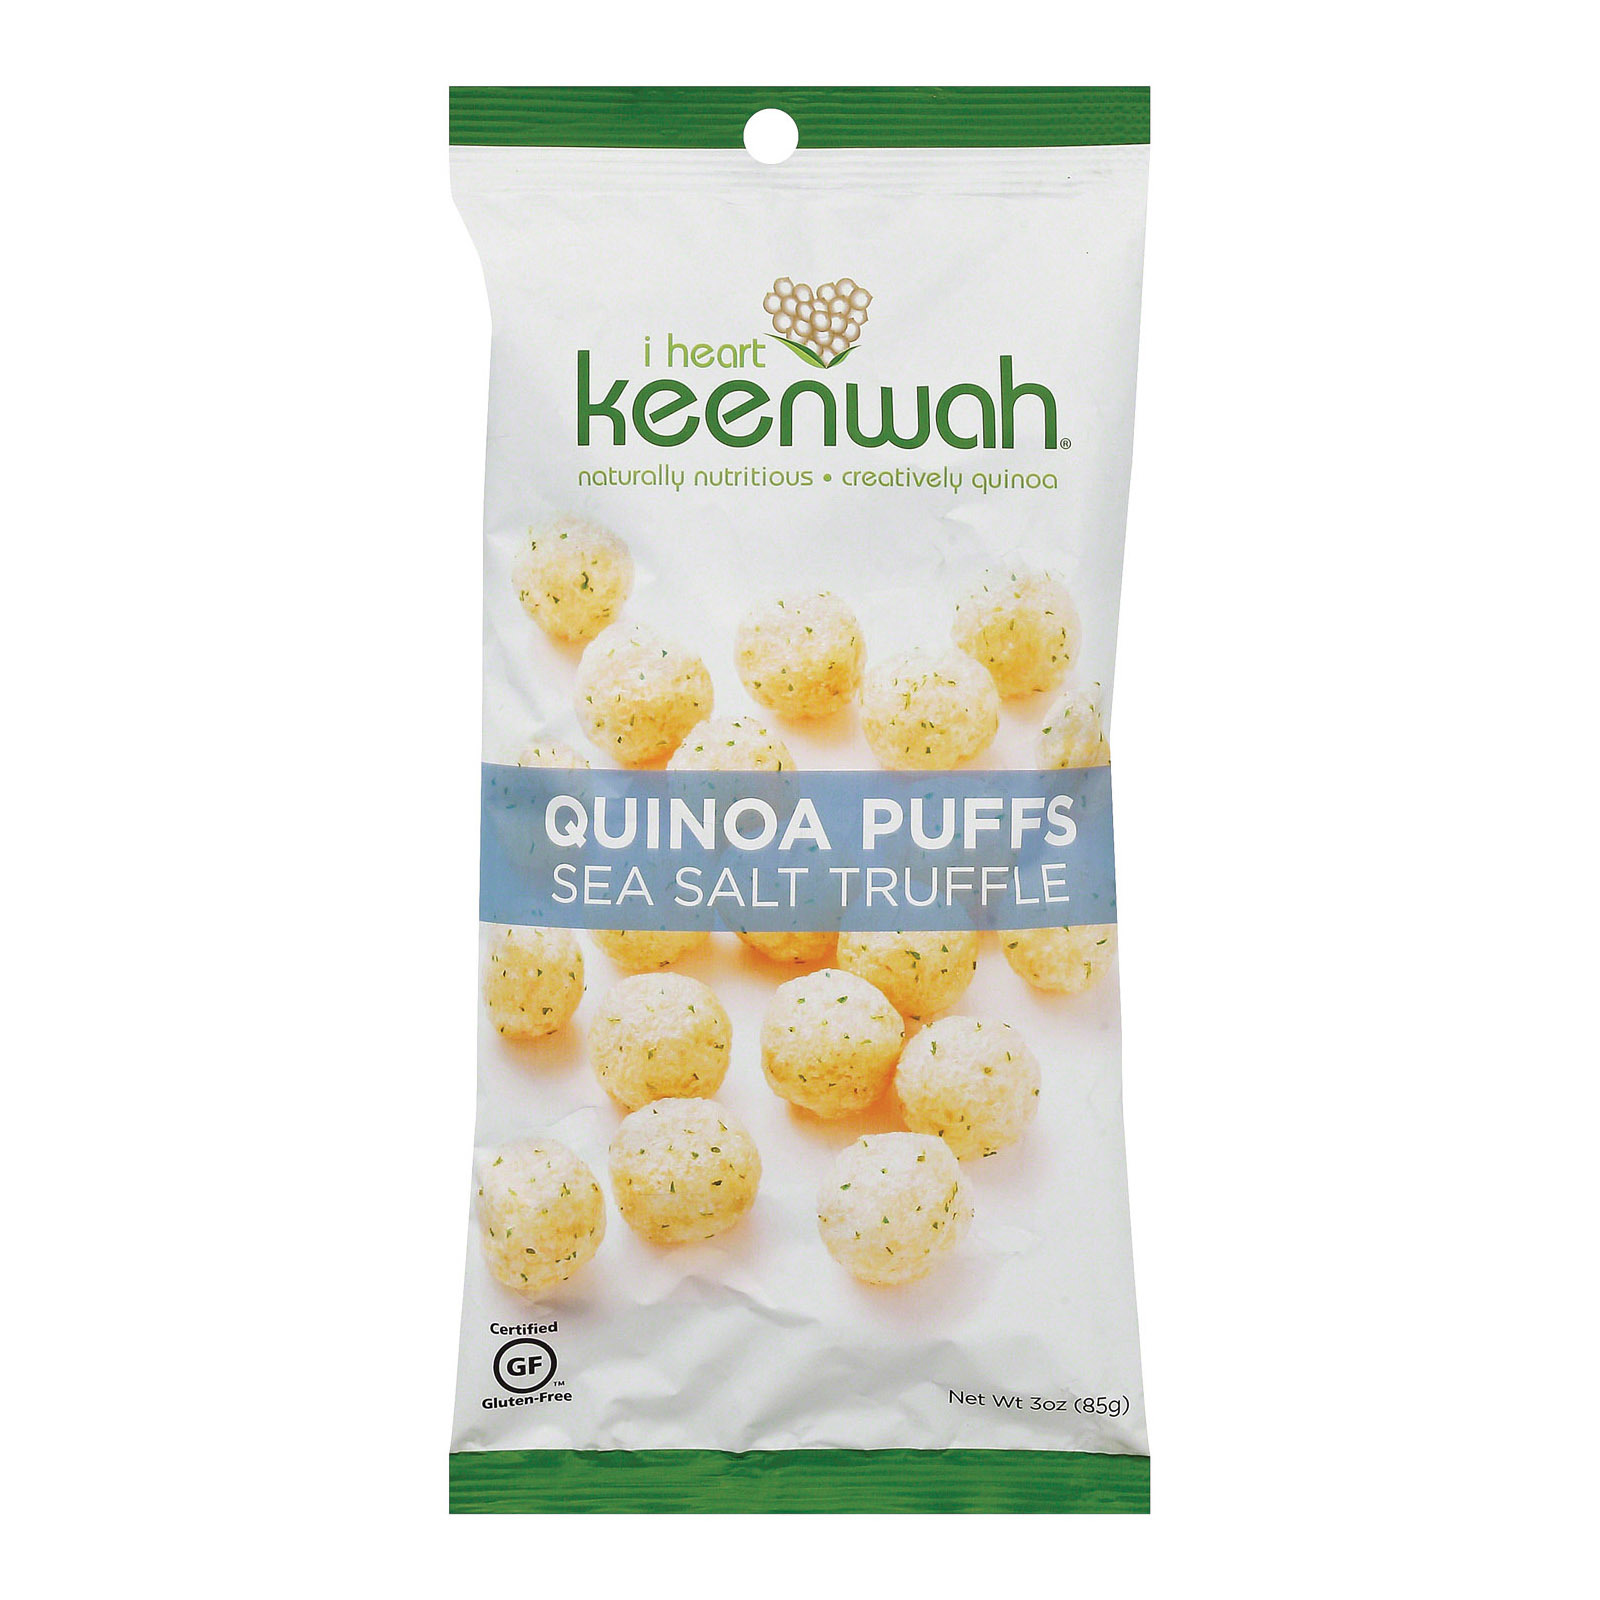 I Heart Keenwah Quinoa Puffs - Sea Salt Truffle - Case of 12 - 3 oz.